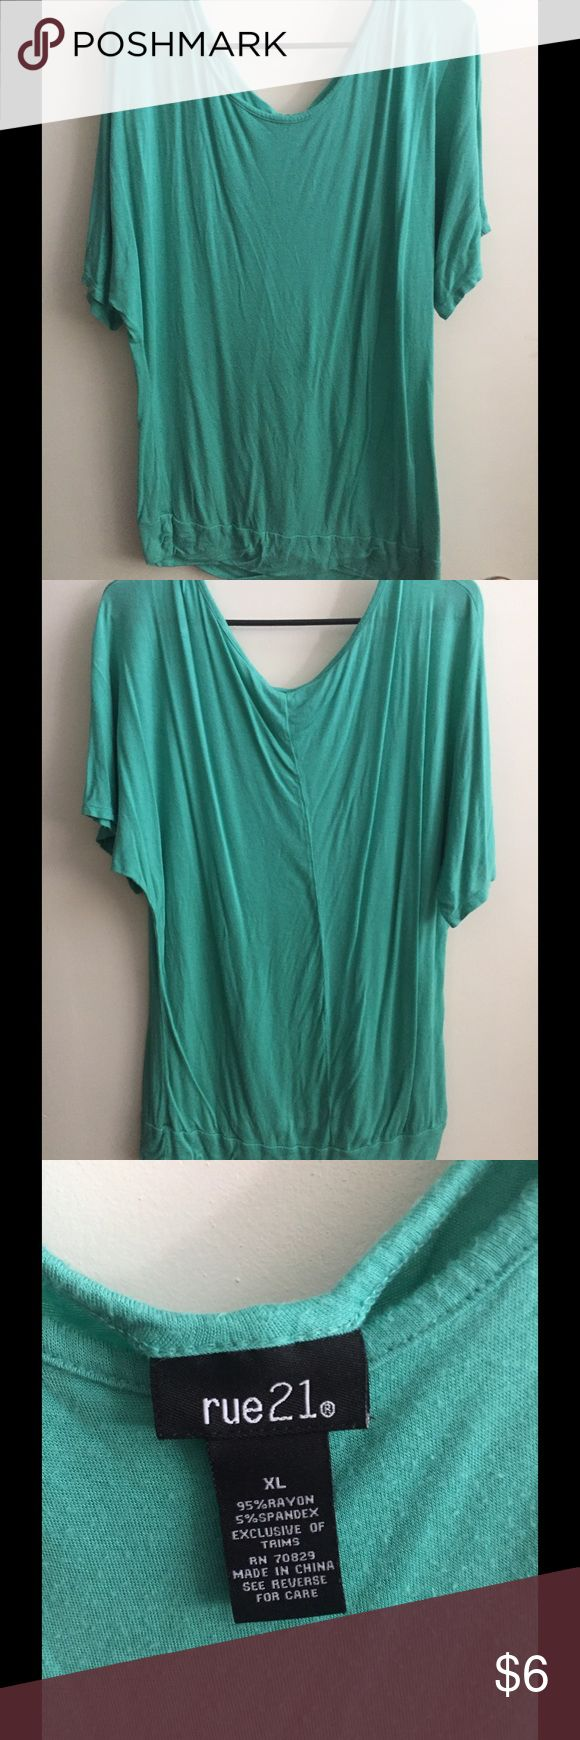 Teal Green Dolman/Batwing Shirt Teal green dolman/batwing shirt.  Very soft material, long fit, barely worn.  Rue 21 Rue21 Tops